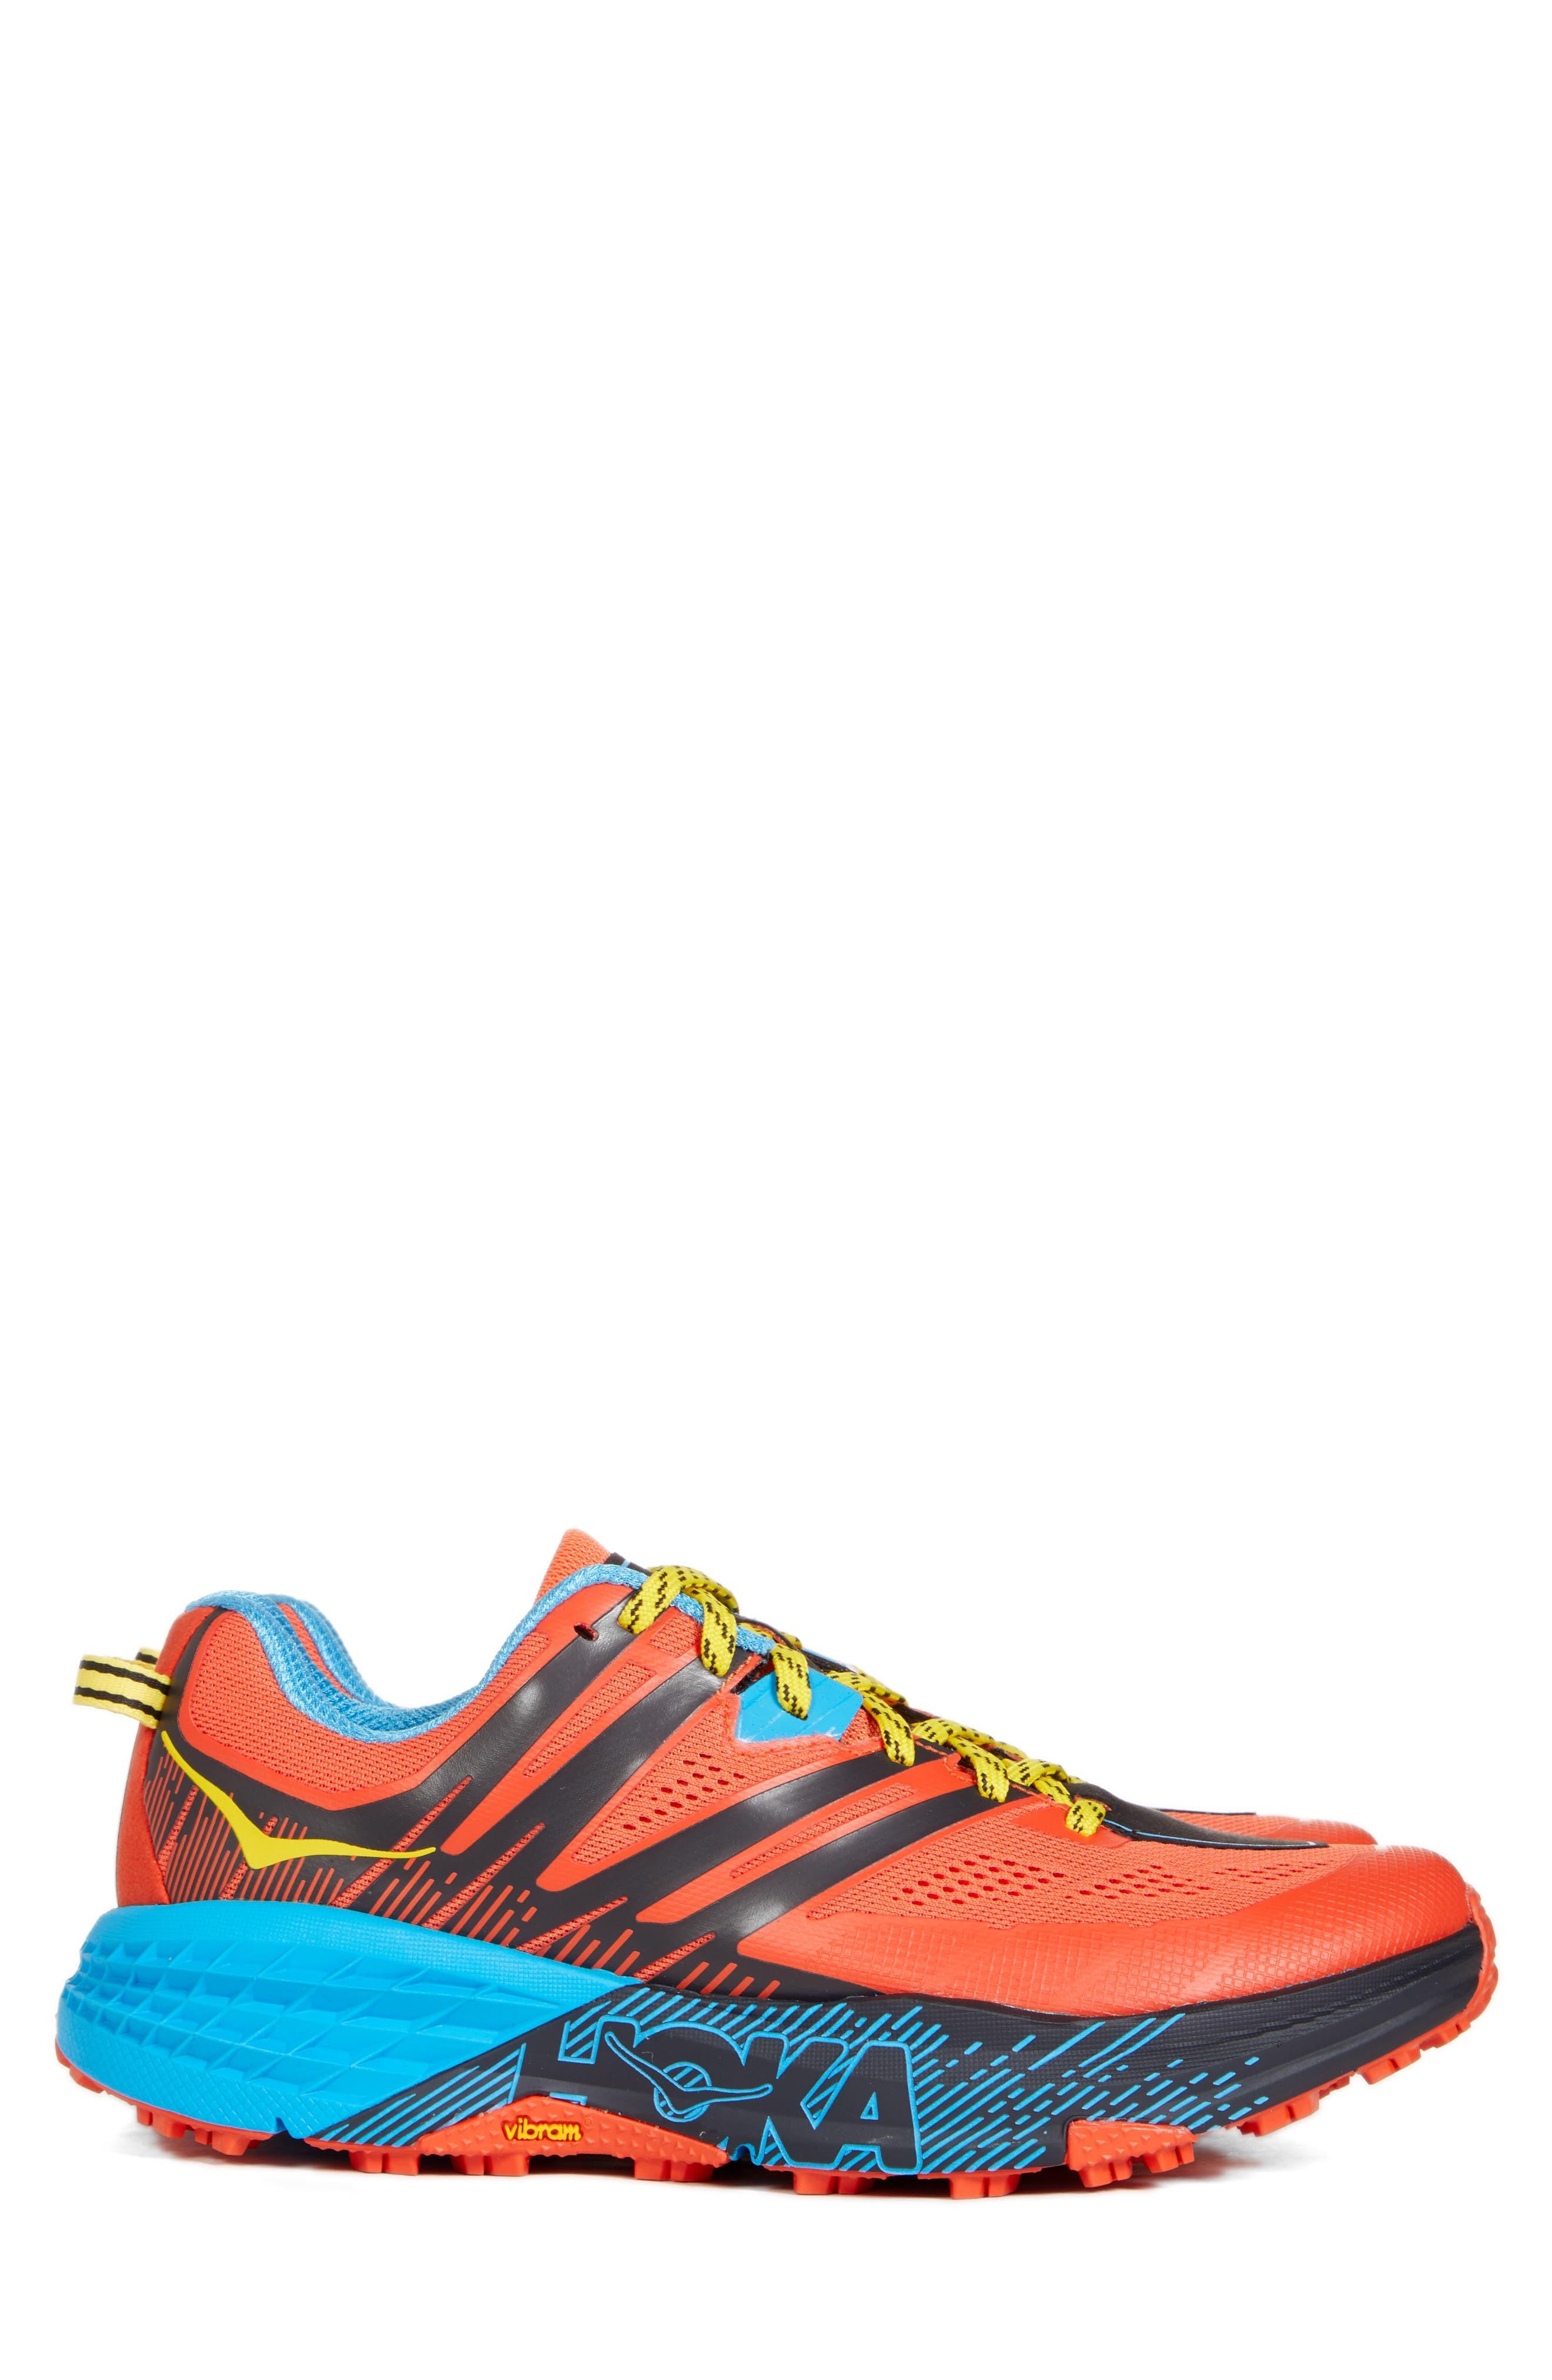 Speedgoat 3 In Nasturtium Trail Hoka Shop Shoe Running One 1q4PqnAg